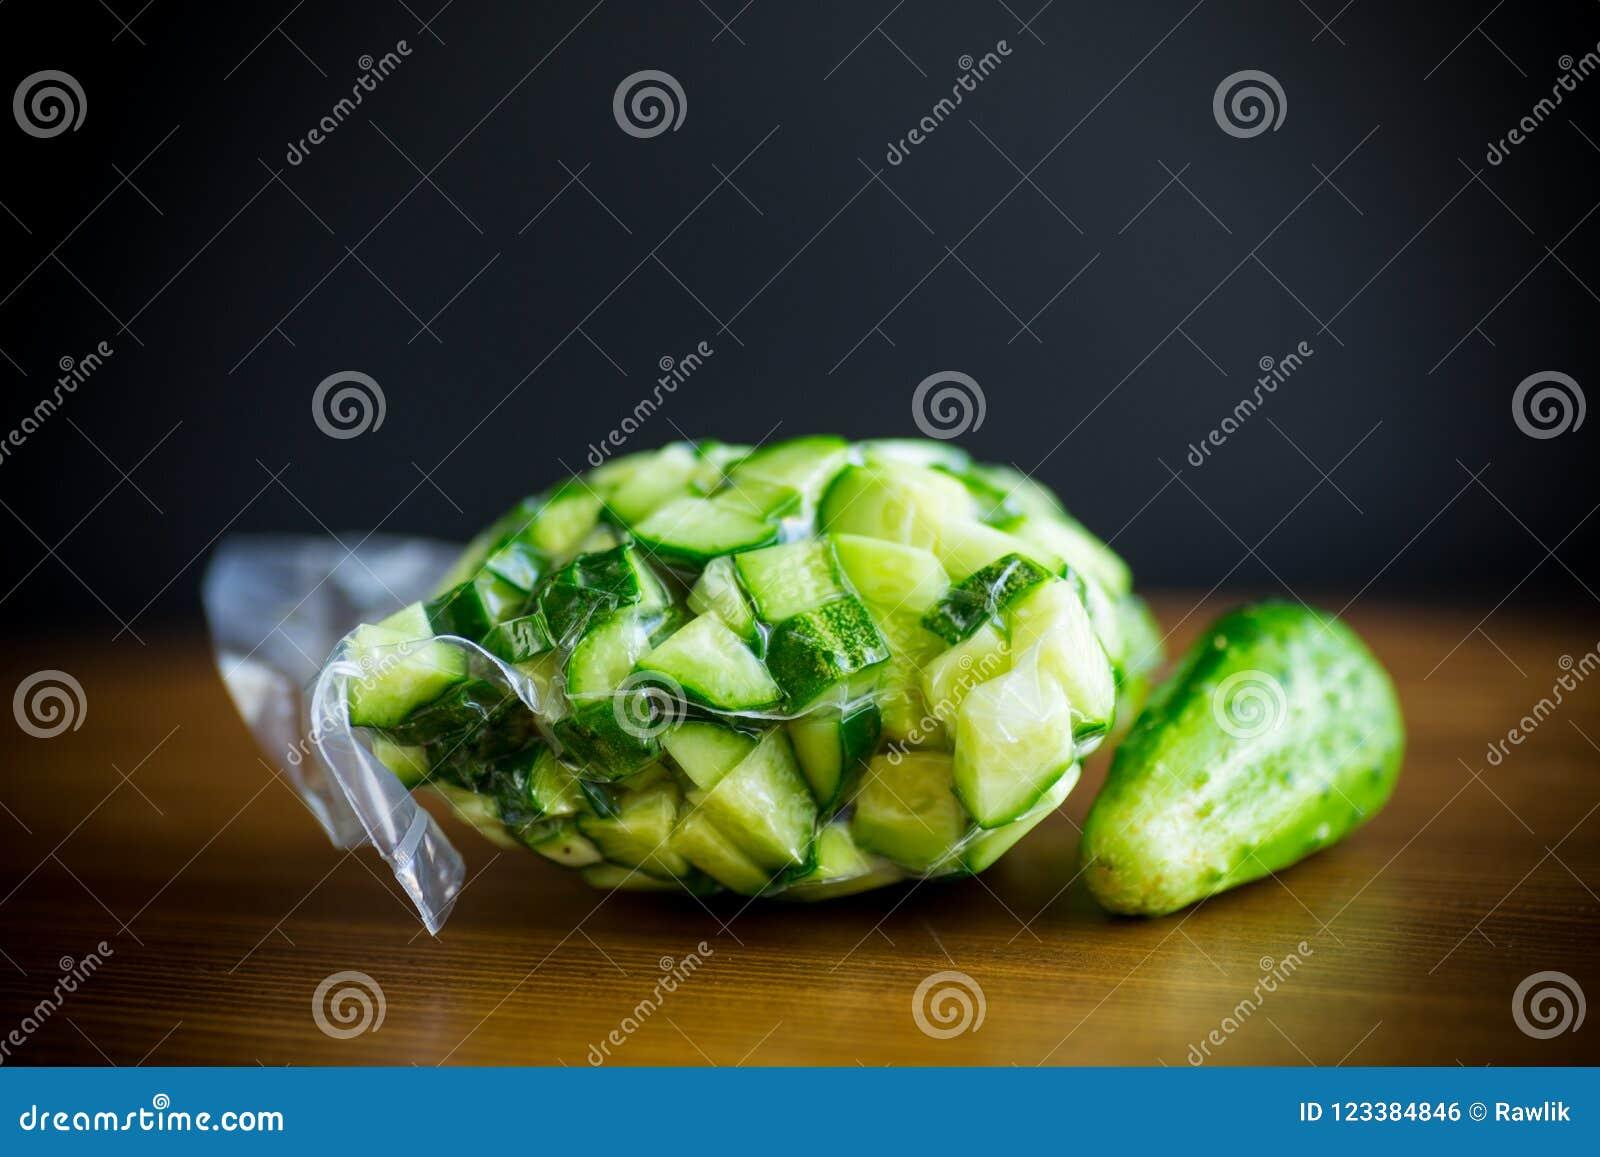 Fresh sliced cucumbers in a vacuum package